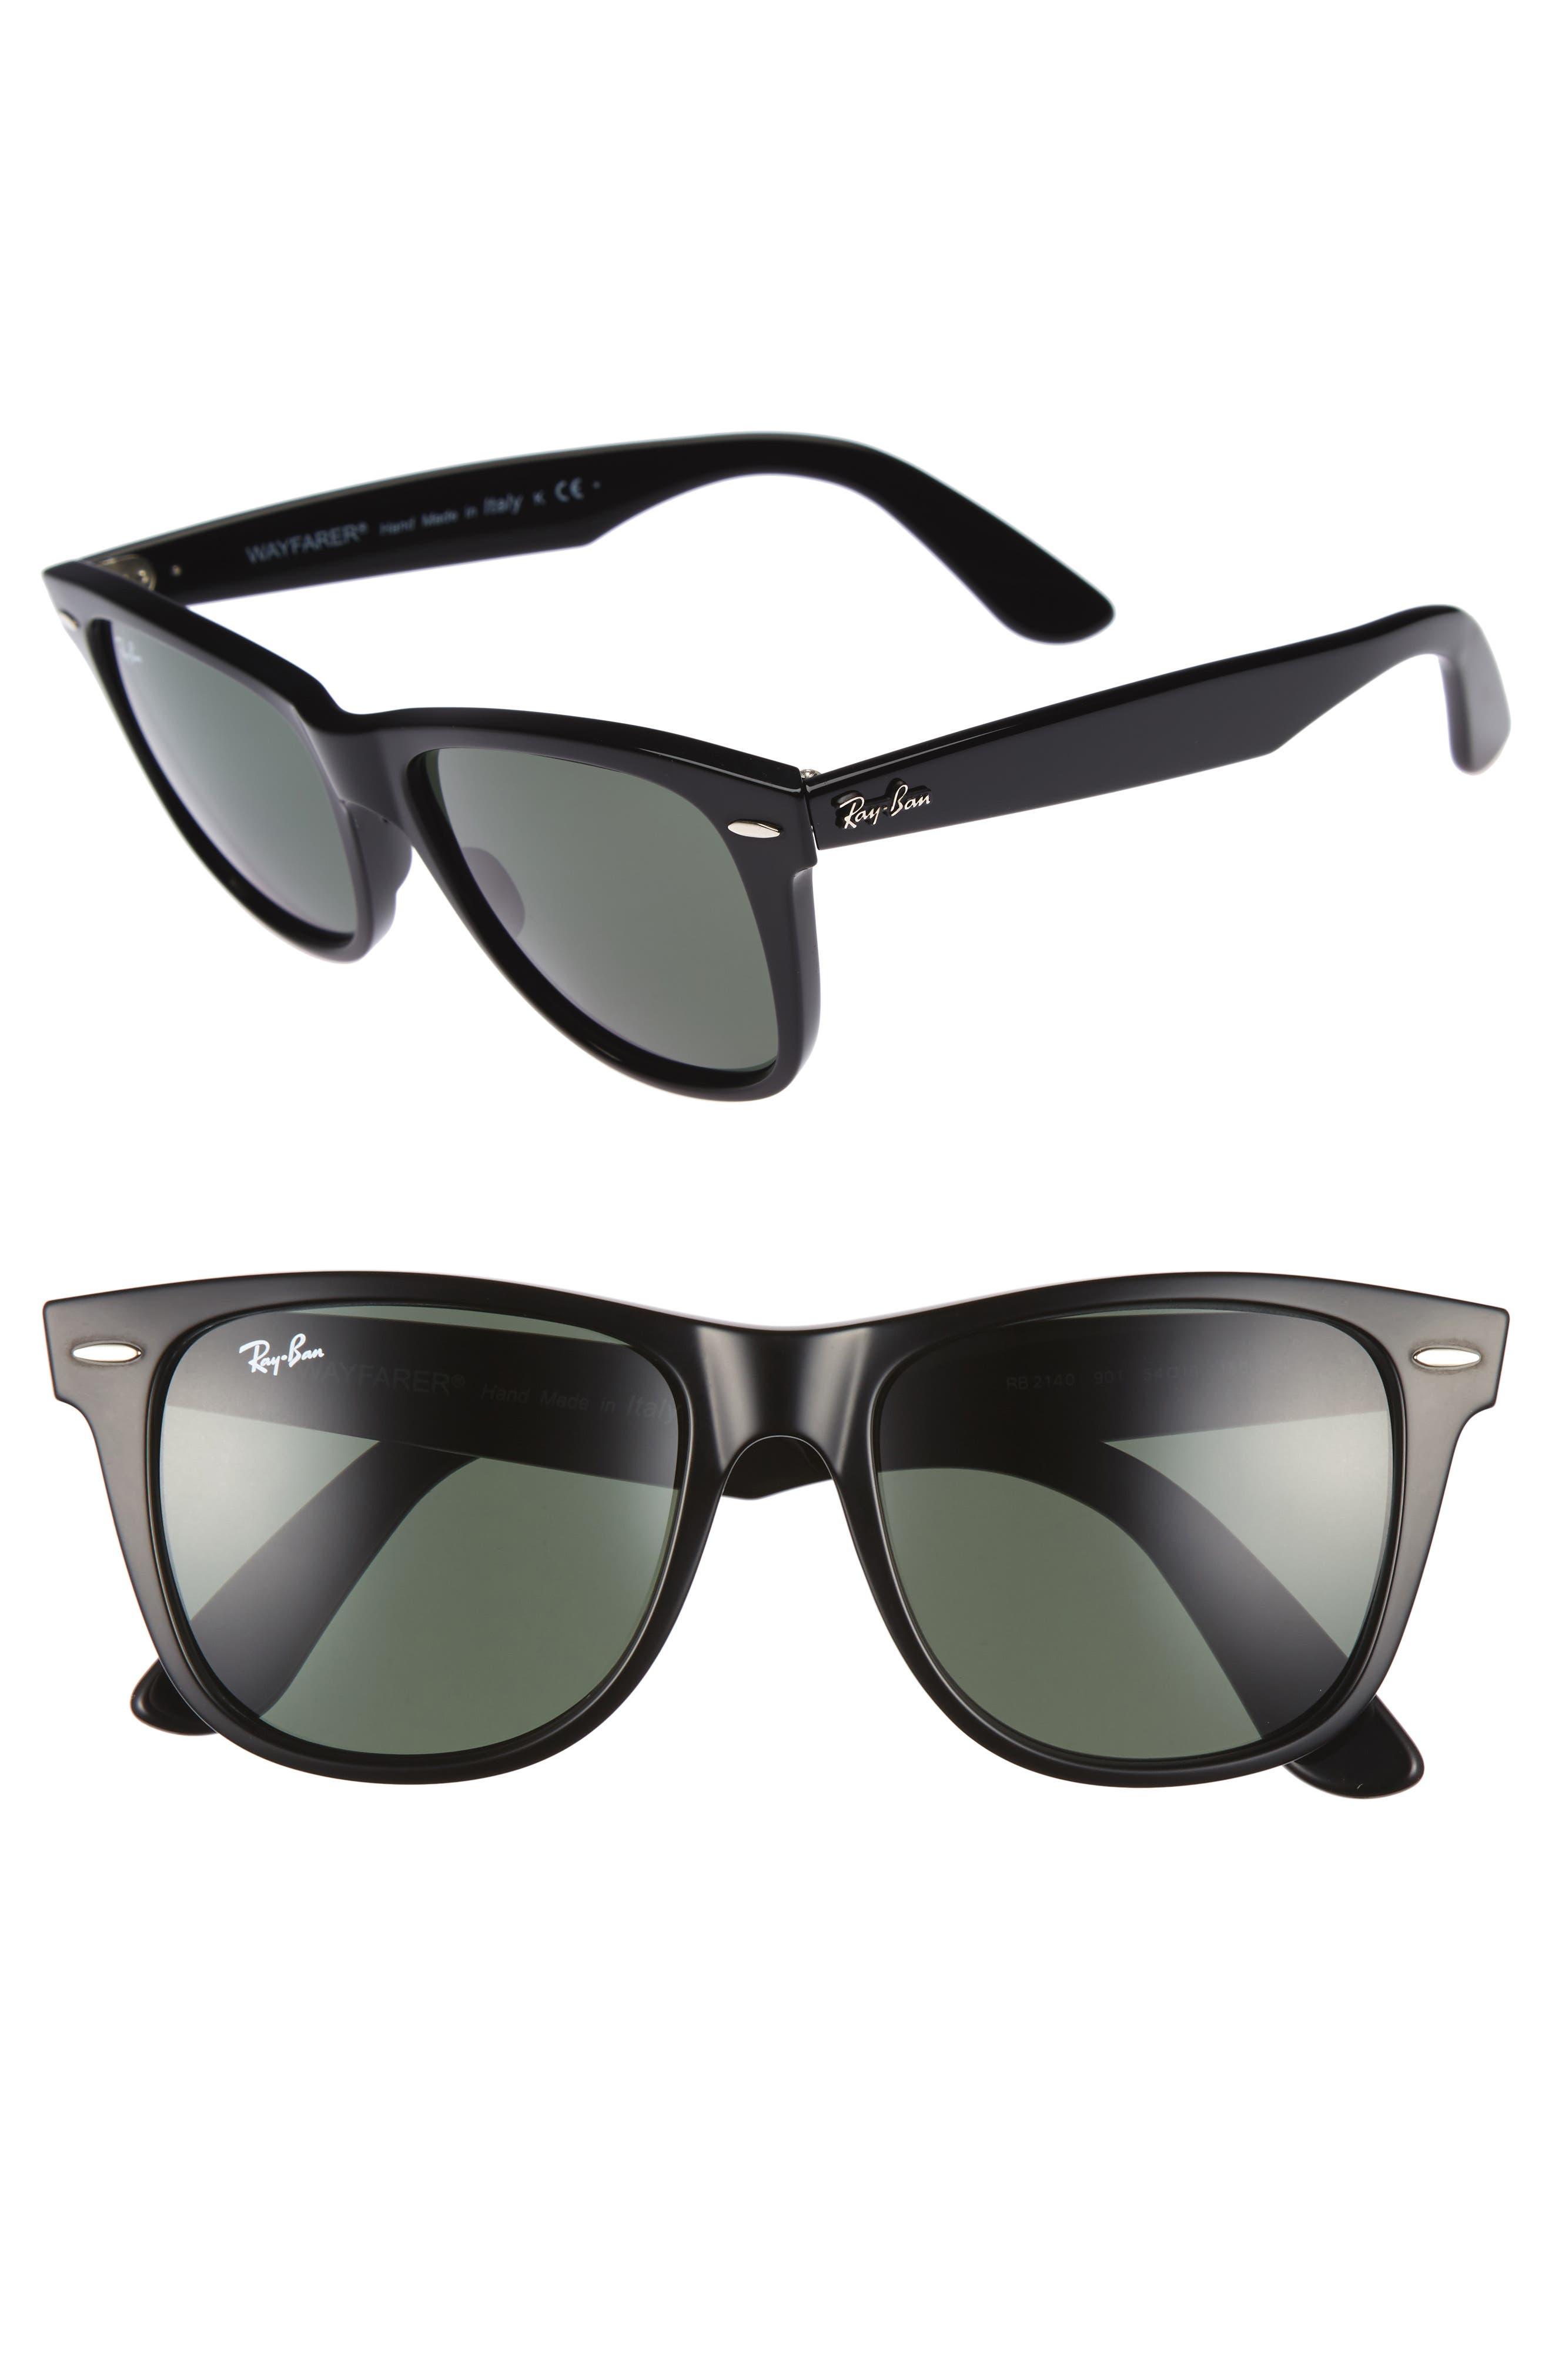 Ray-Ban Classic Wayfarer 5m Sunglasses -